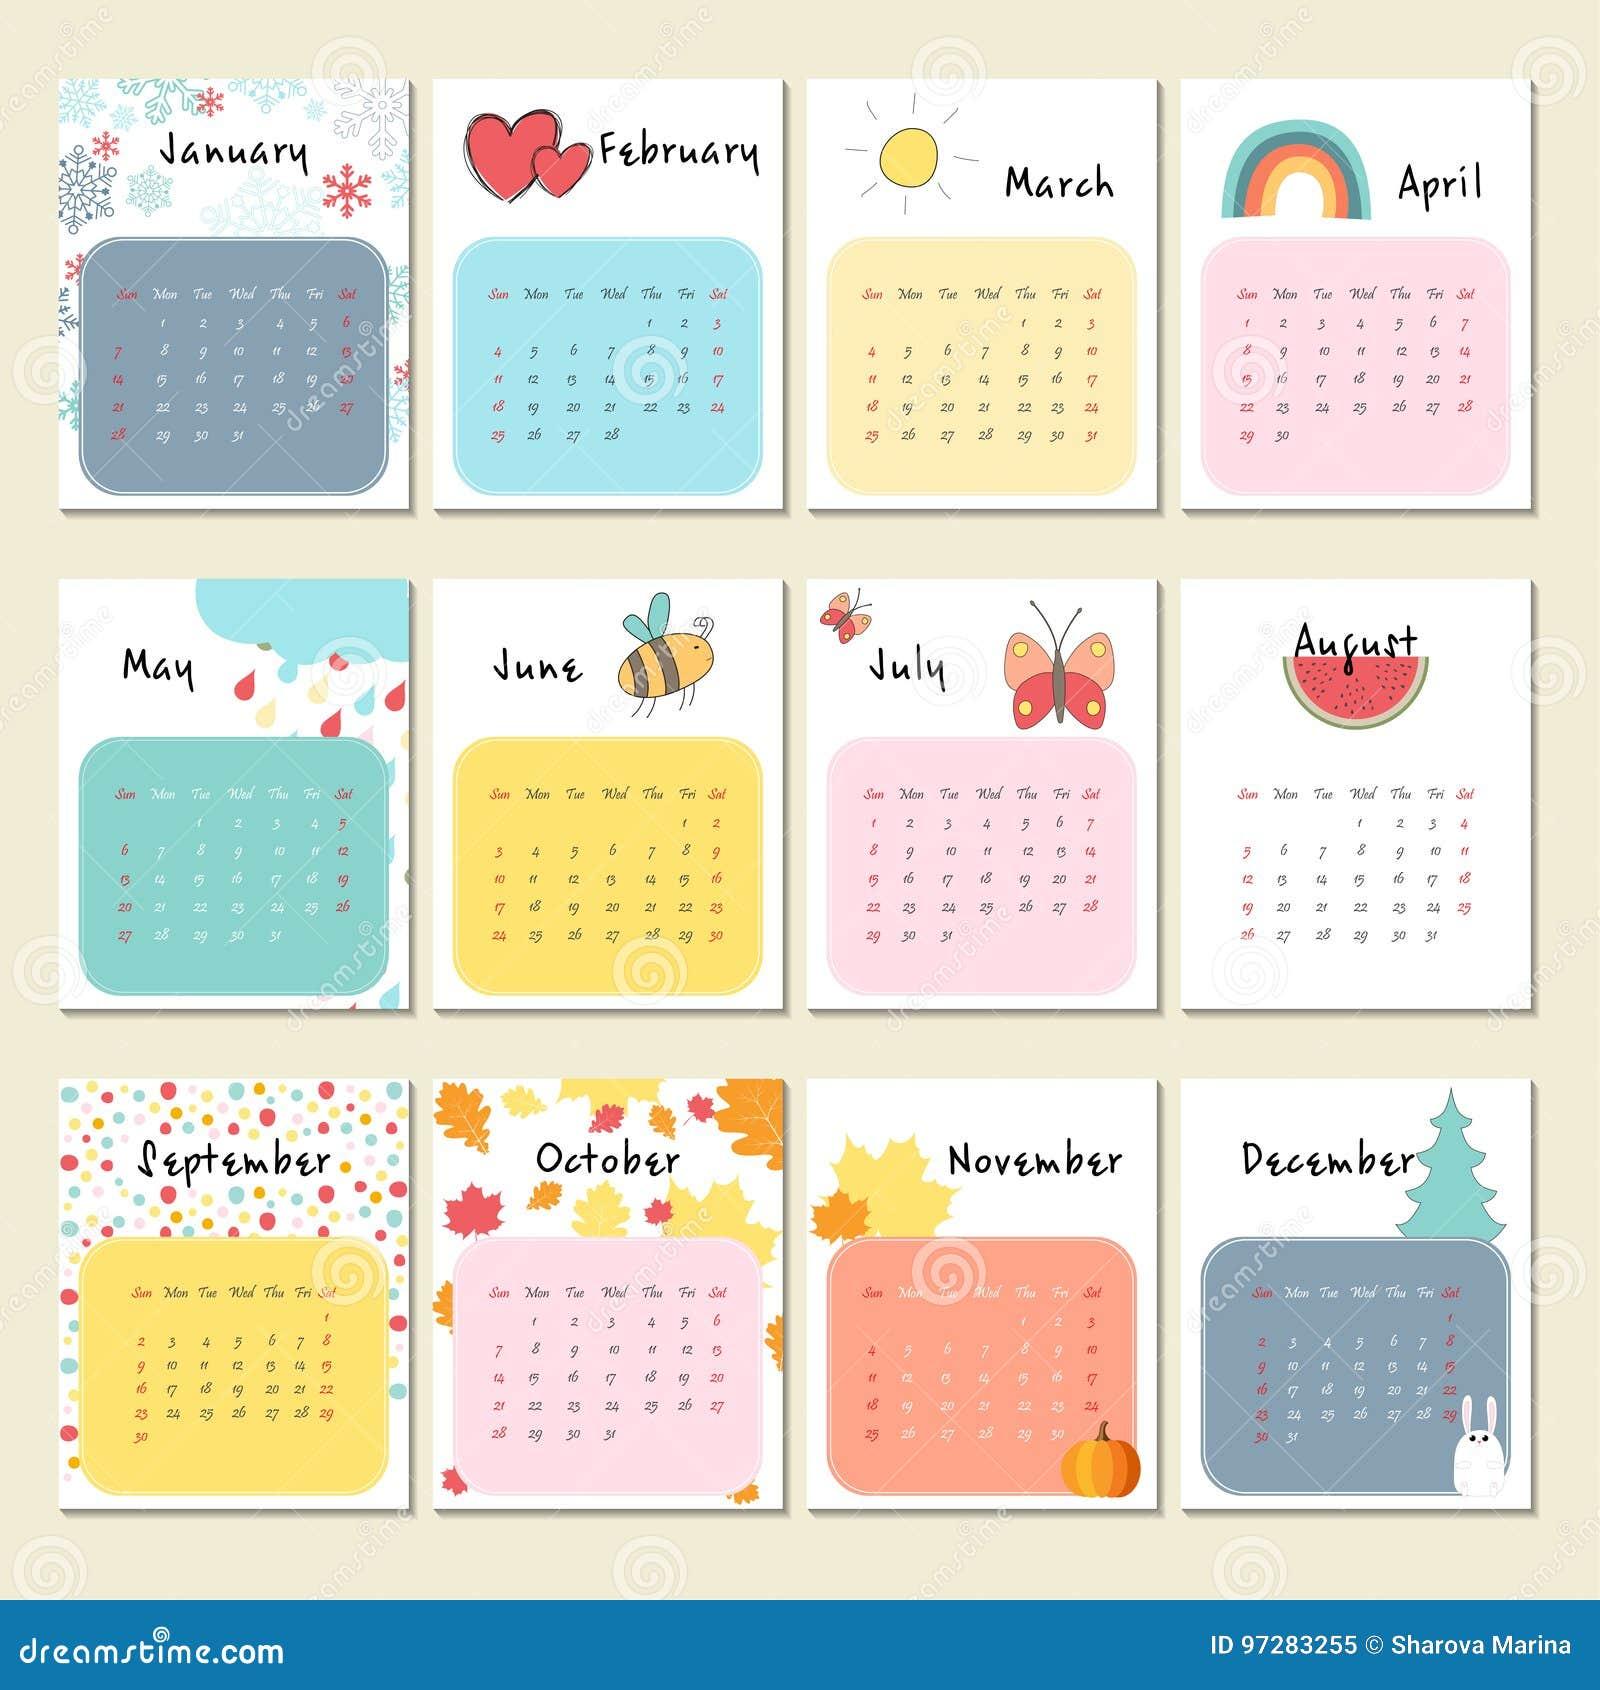 Cute Calendar Illustration : Unusual cute calendar for stock vector illustration